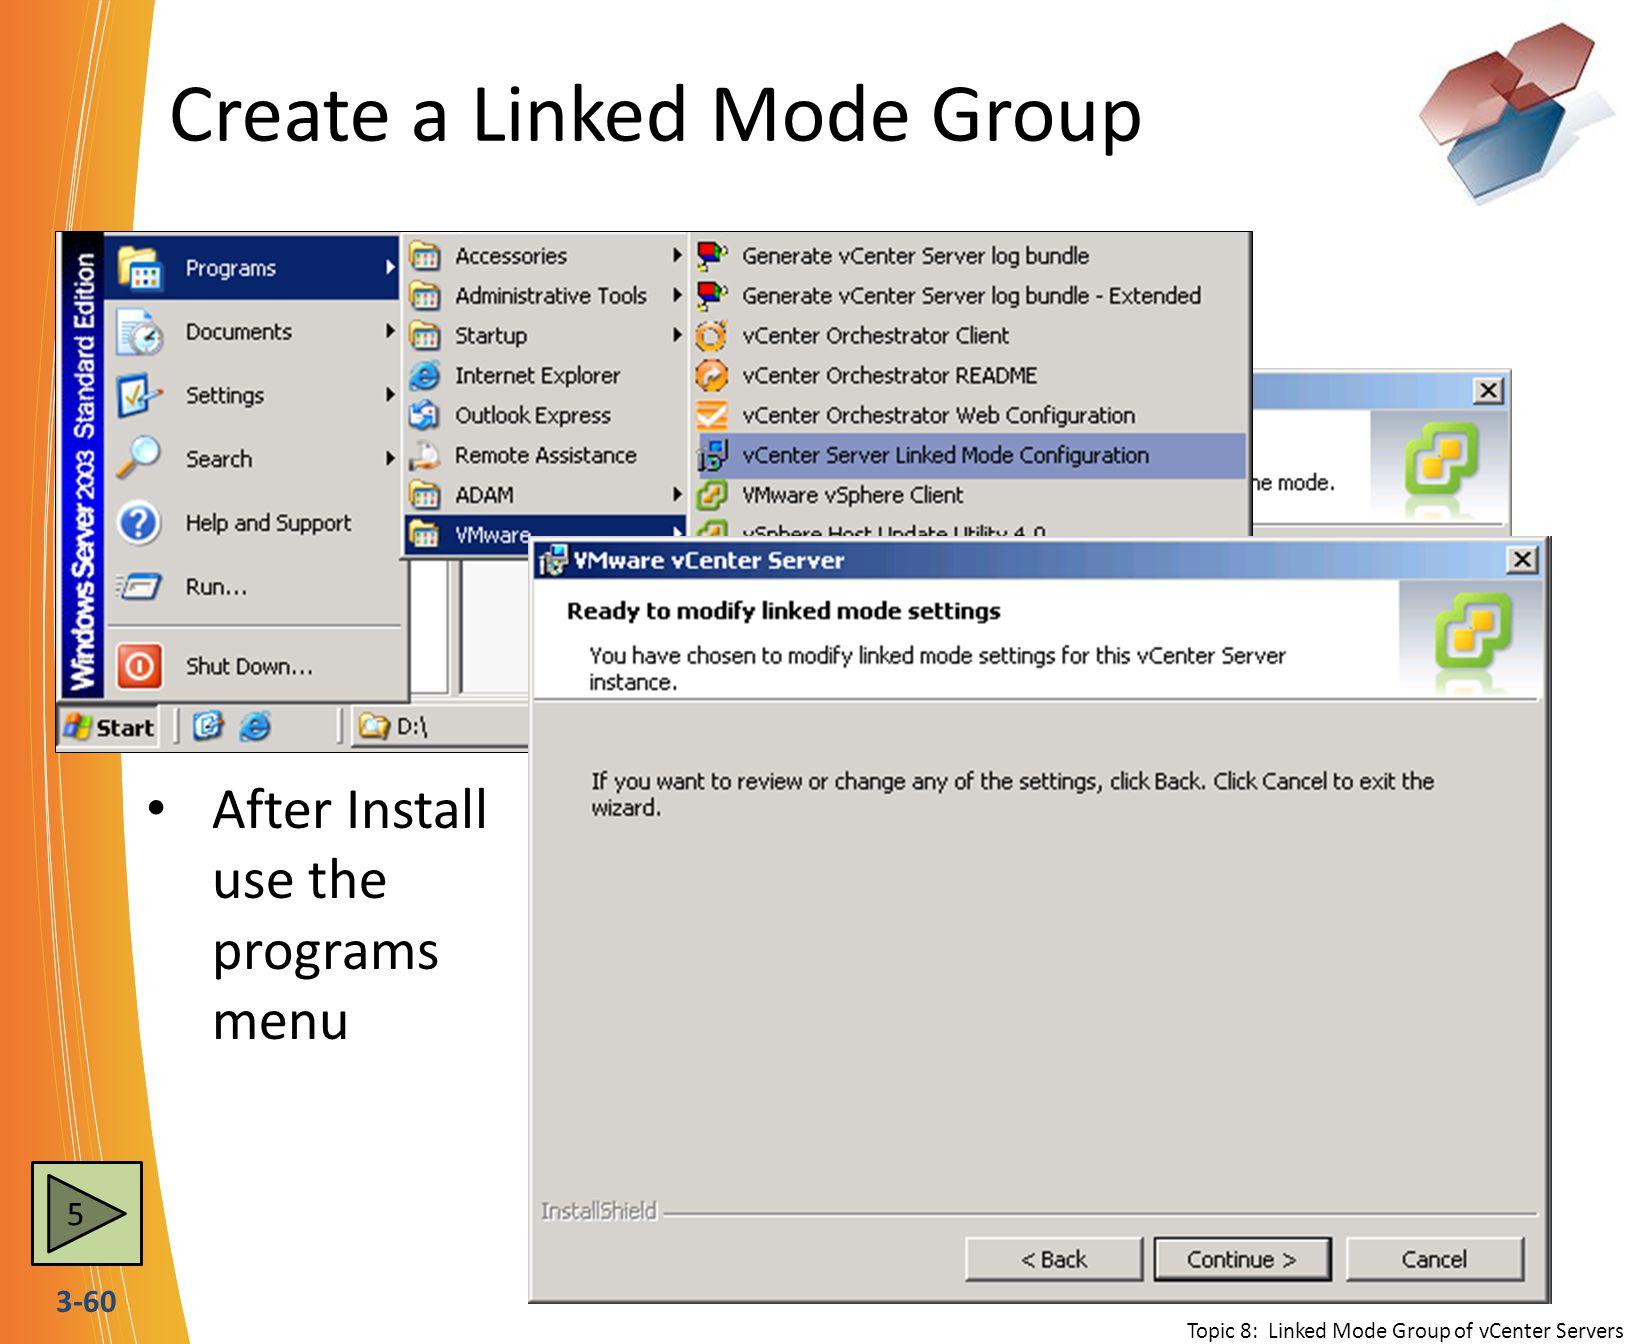 Create a Linked Mode Group